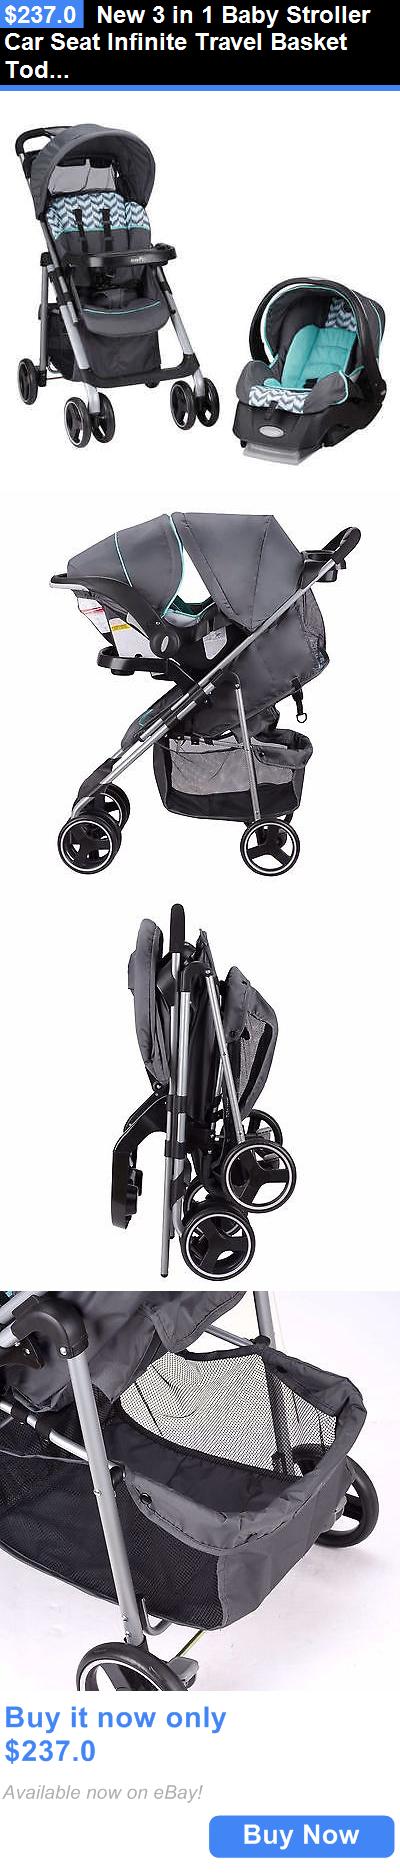 baby kid stuff New 3 In 1 Baby Stroller Car Seat Infinite